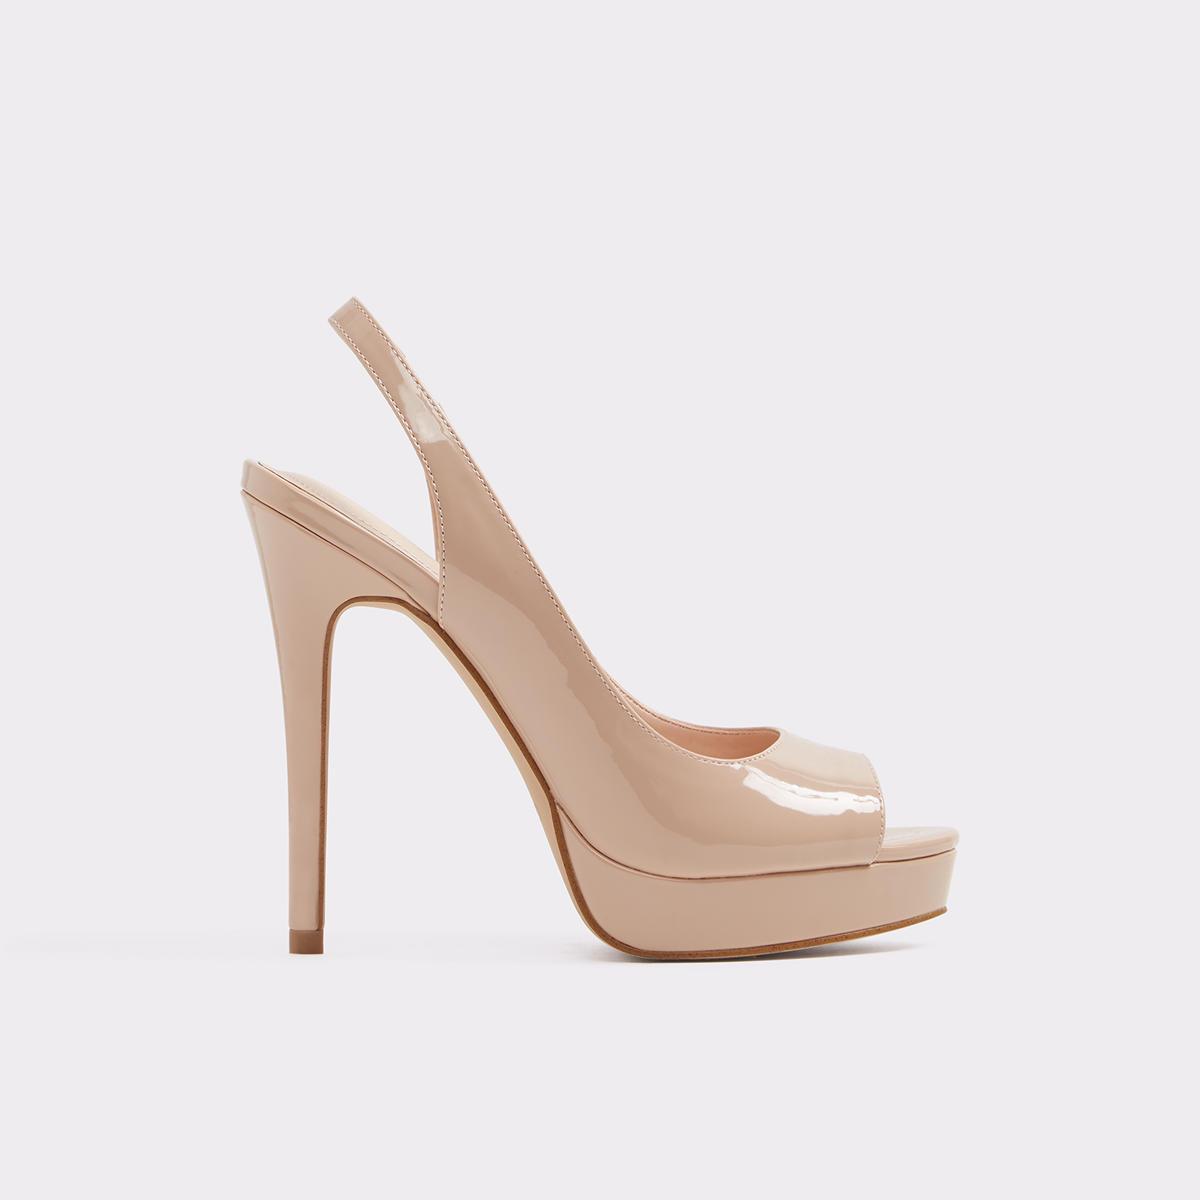 4527c4043d7d Sicinski Black Nubuck Women s Open-Toe Heels